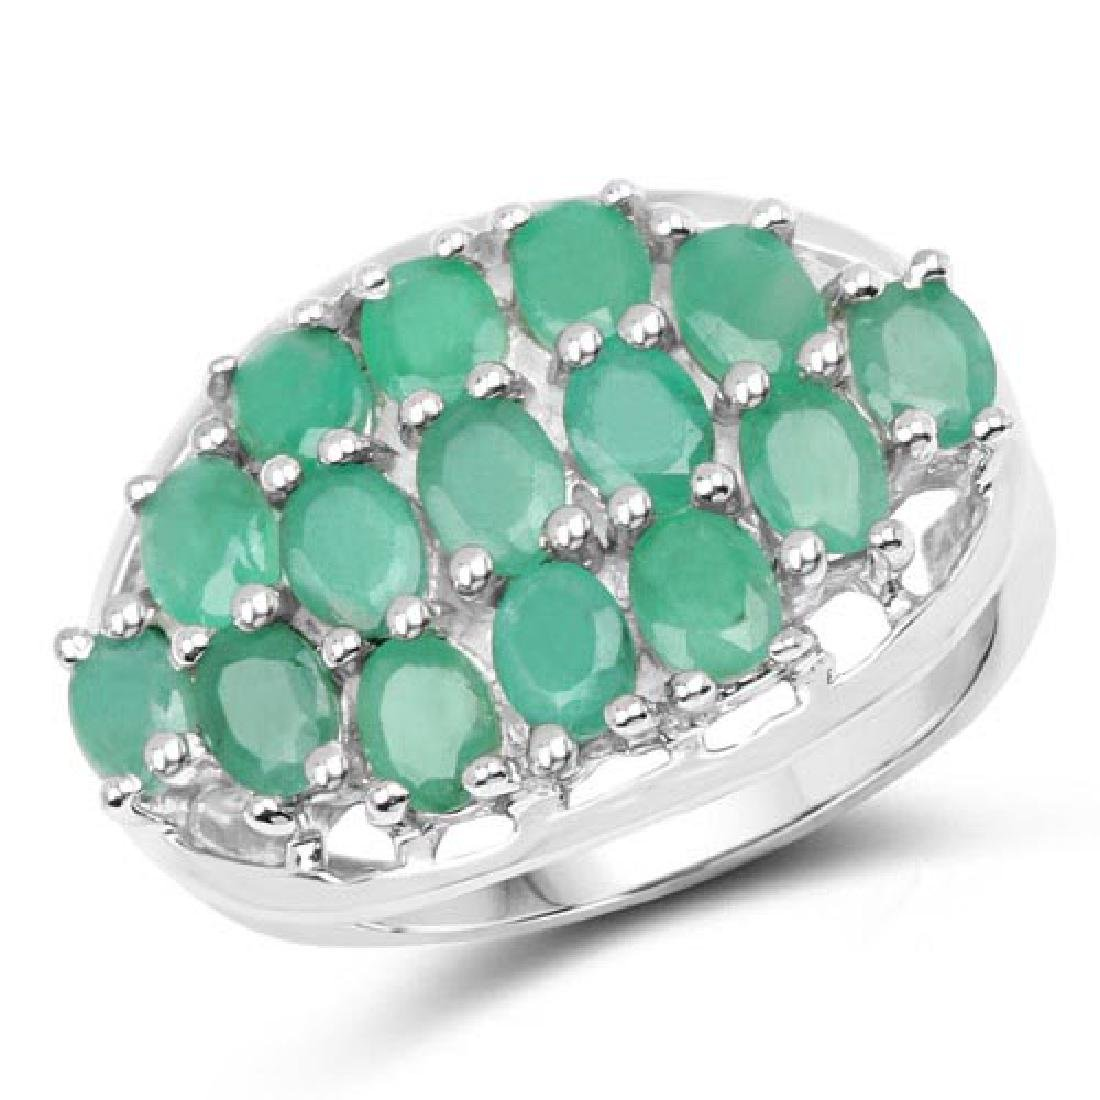 2.10 Carat Genuine Emerald .925 Sterling Silver Ring